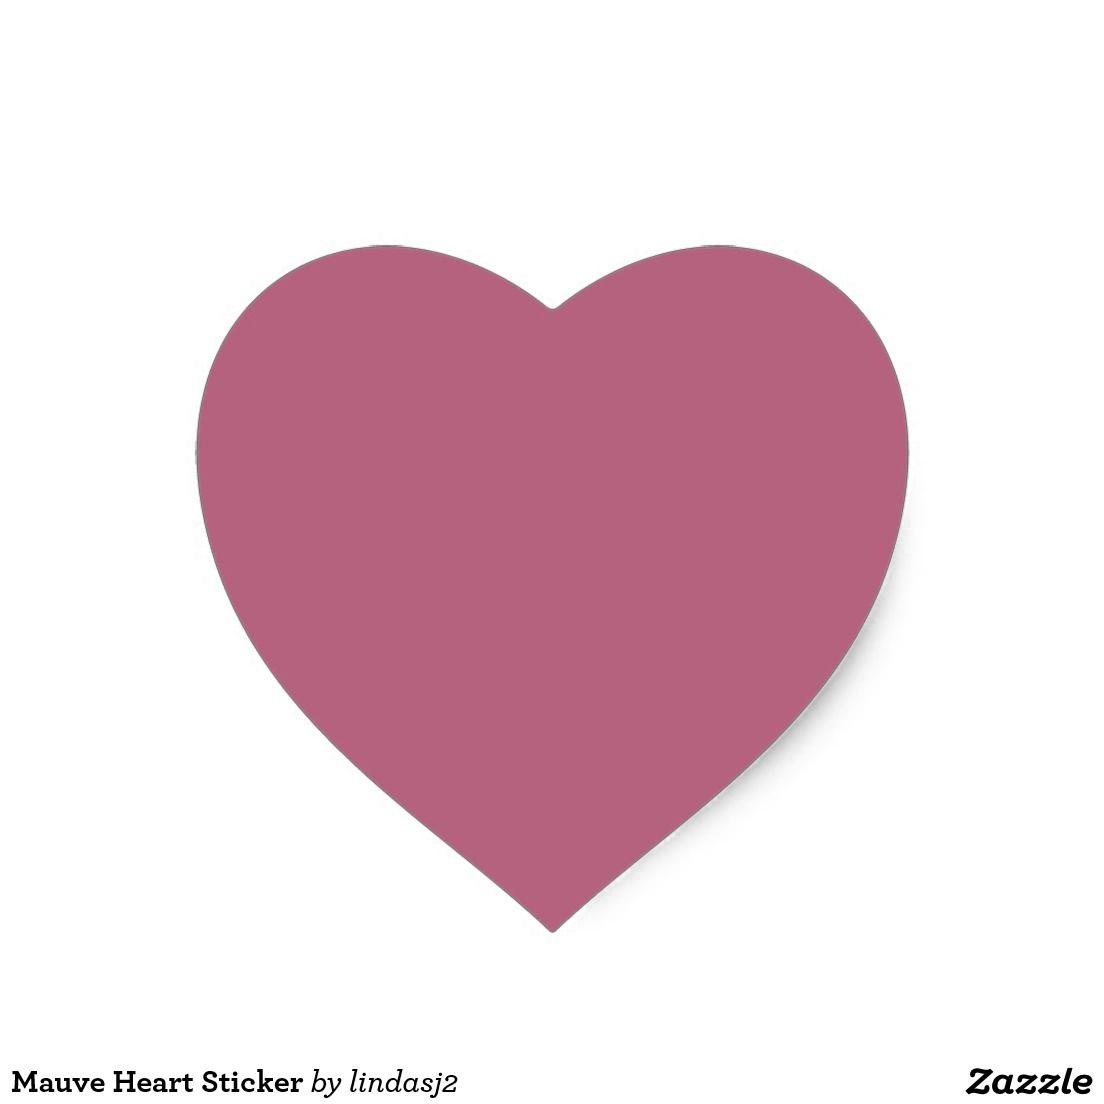 Mauve Heart Sticker